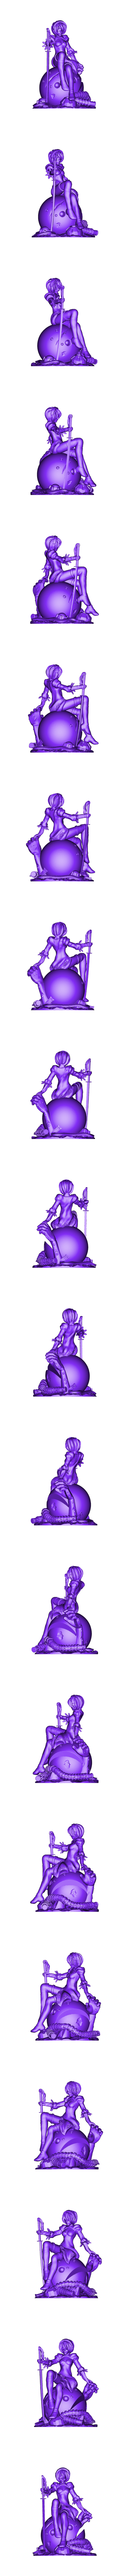 Nier_Automata_full.stl Download free STL file Nier Automata • 3D printable object, MadcapMiniatures